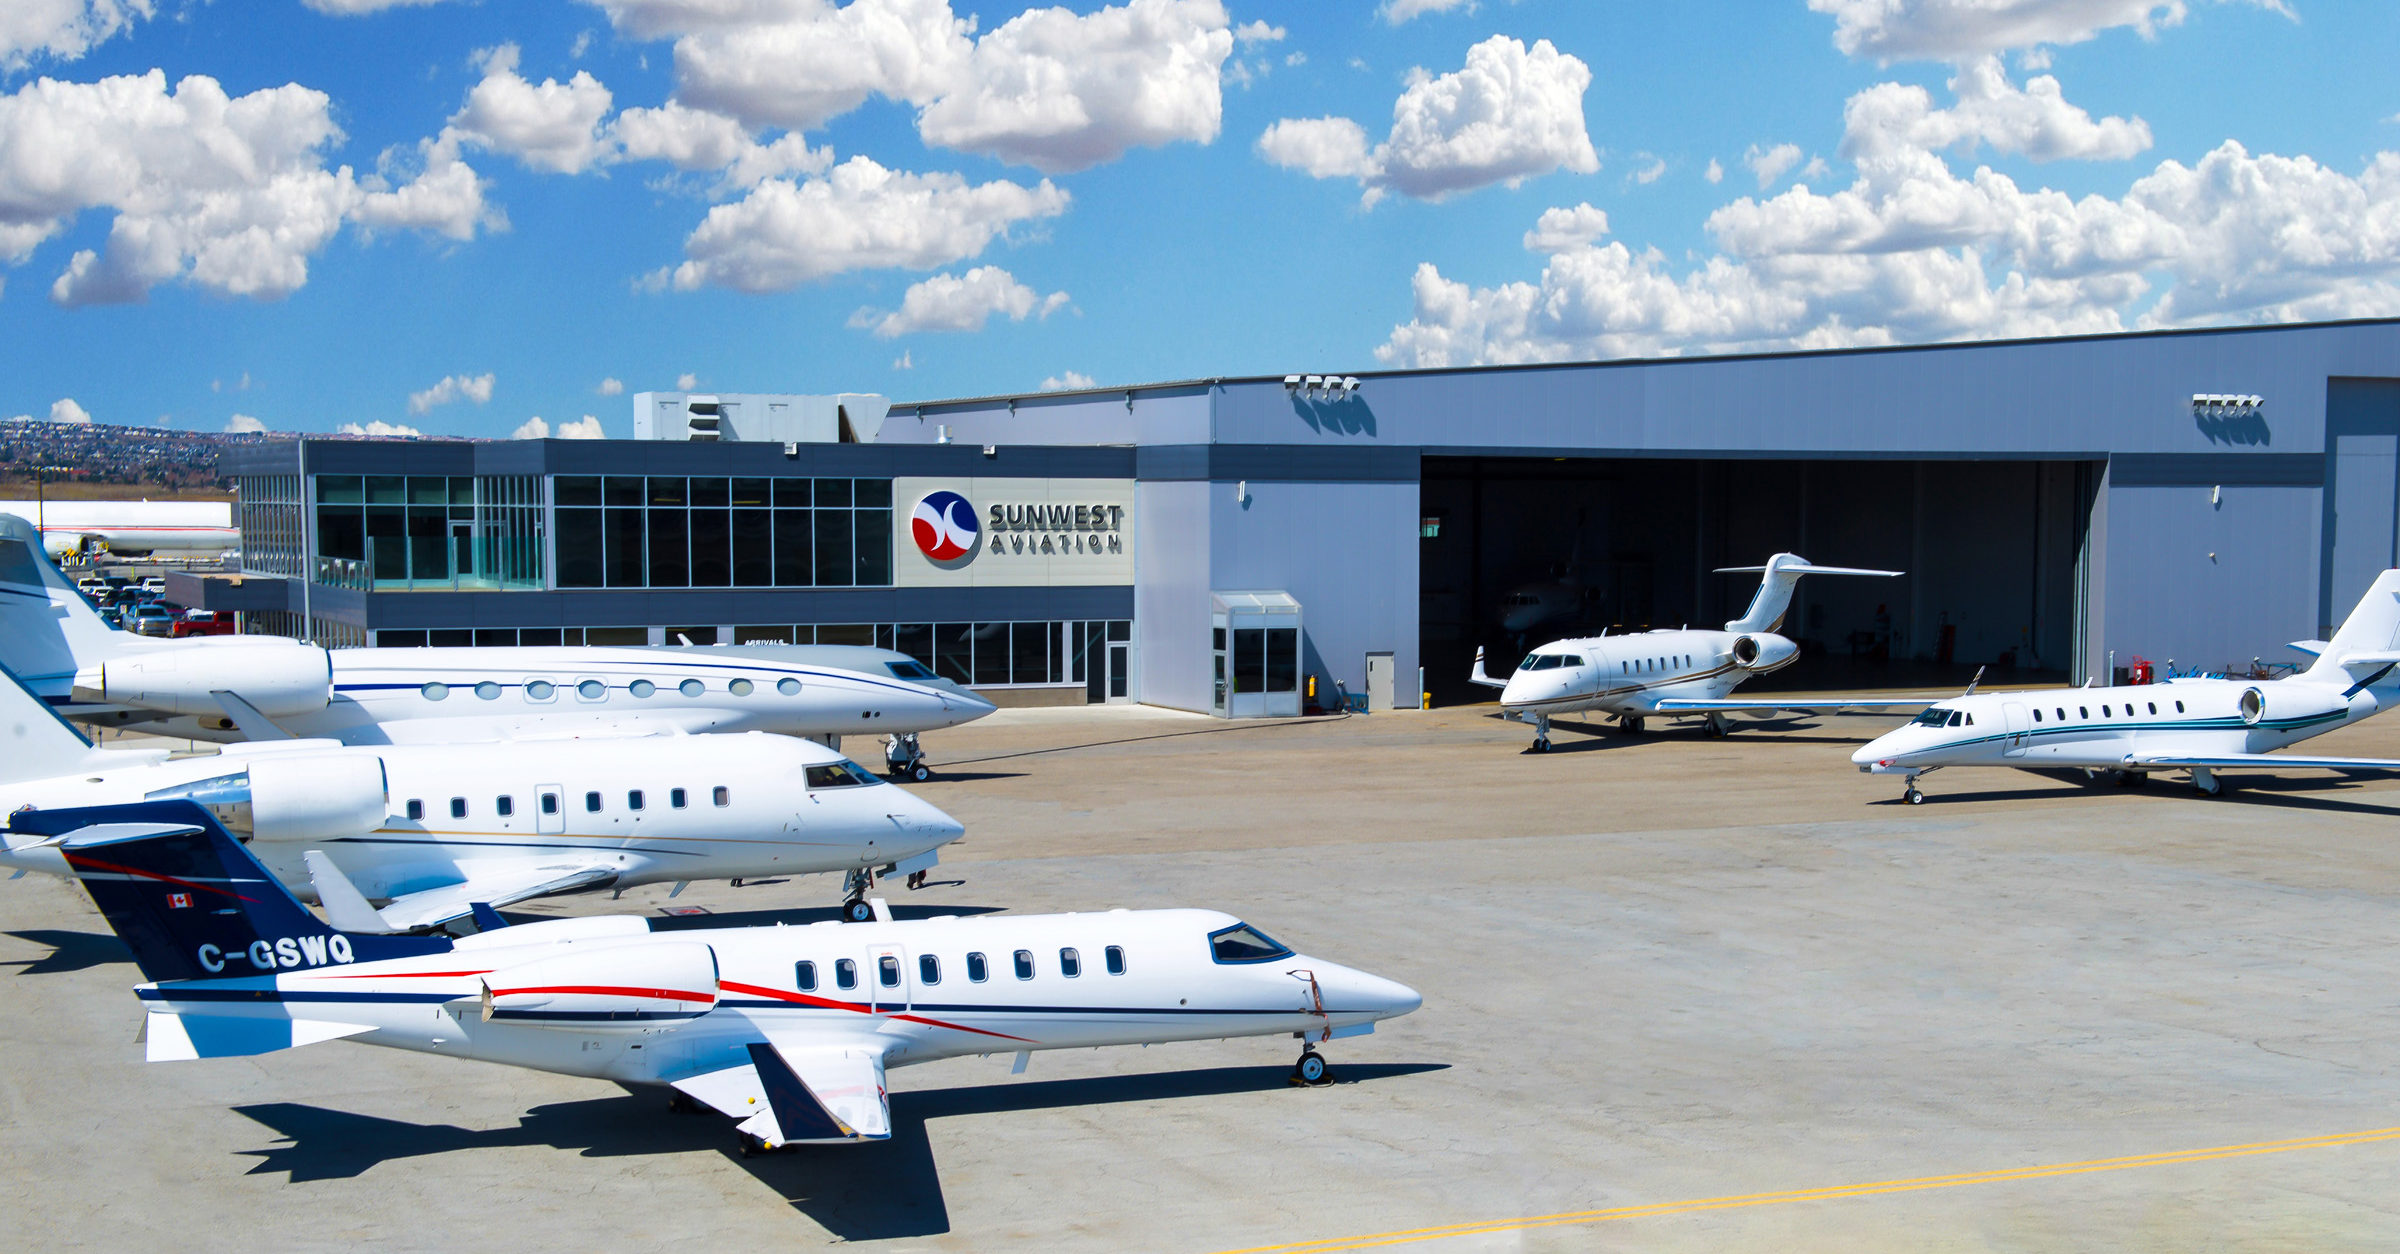 Sunwest Aviation